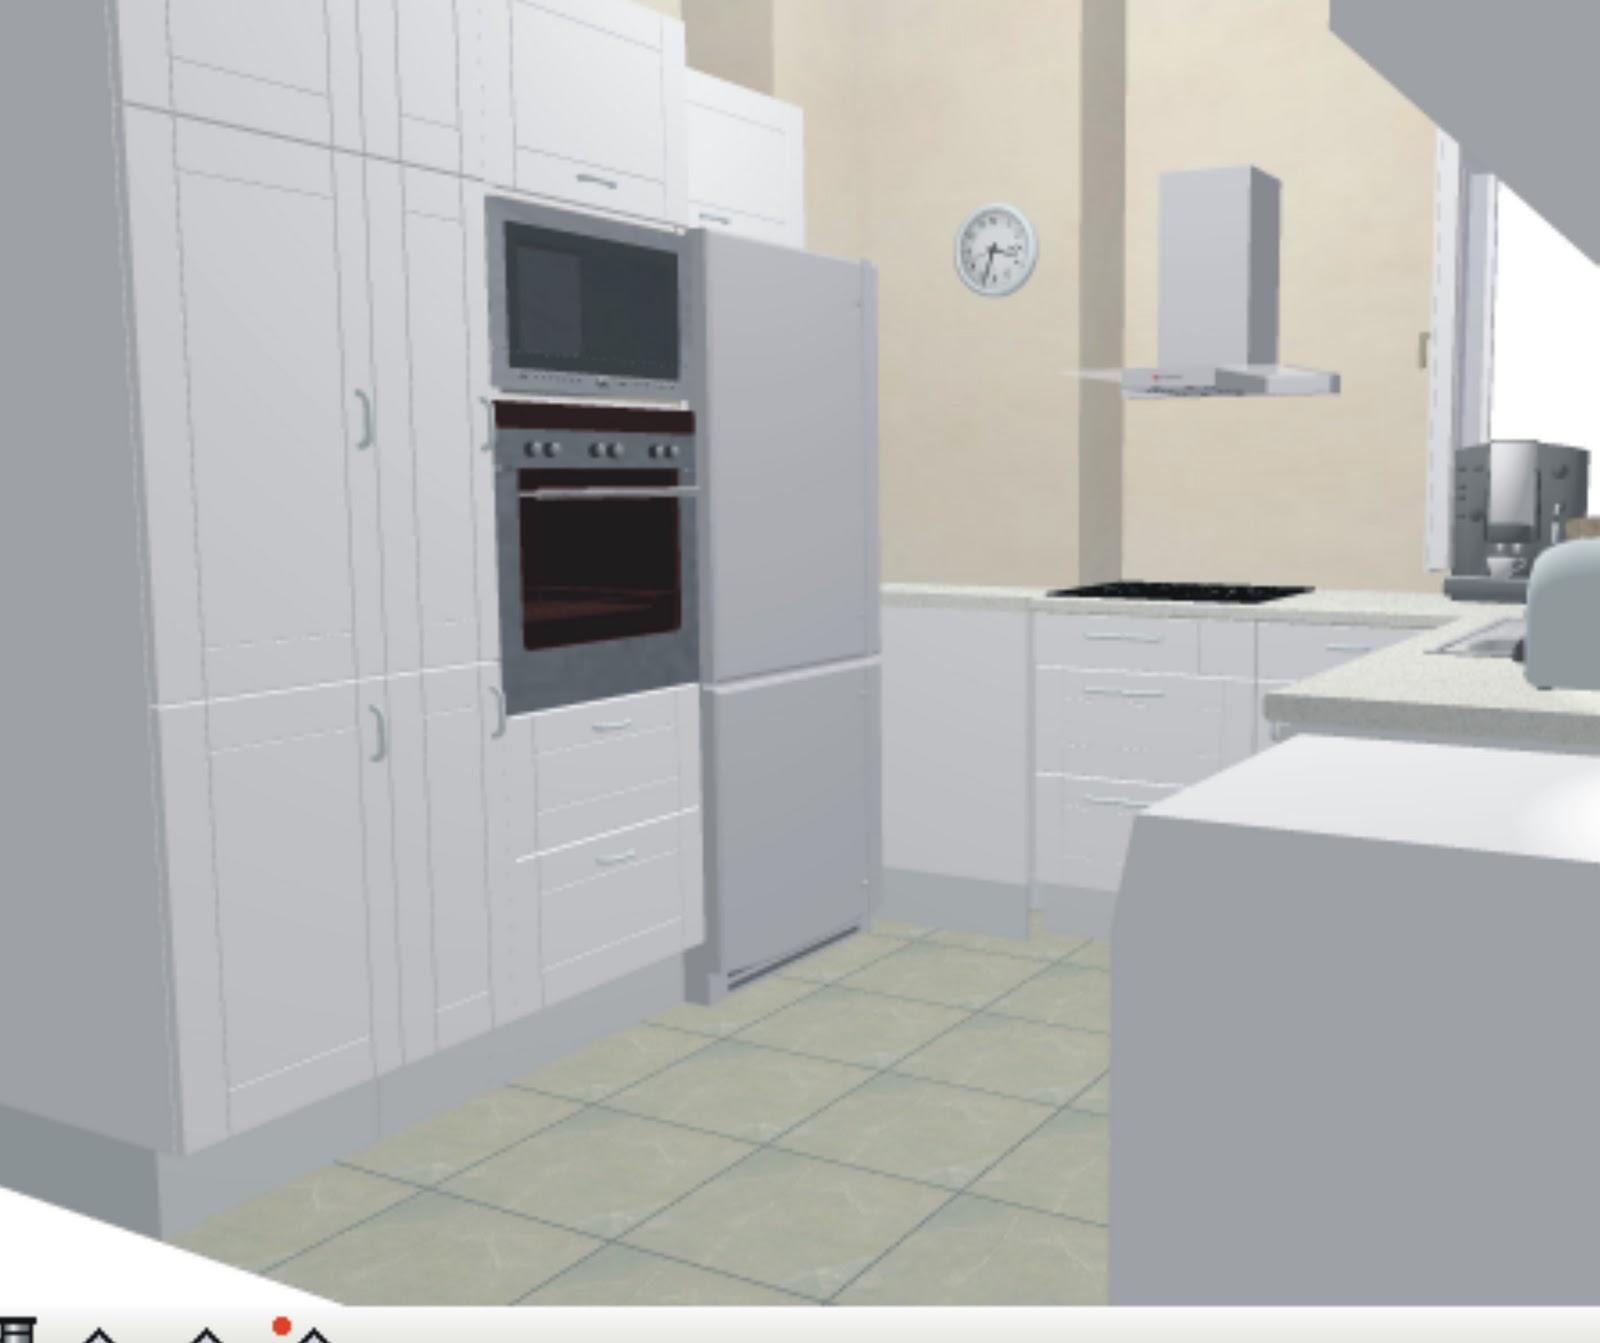 Decorole cocina la cocina de mcrl - Cocina en microondas ...